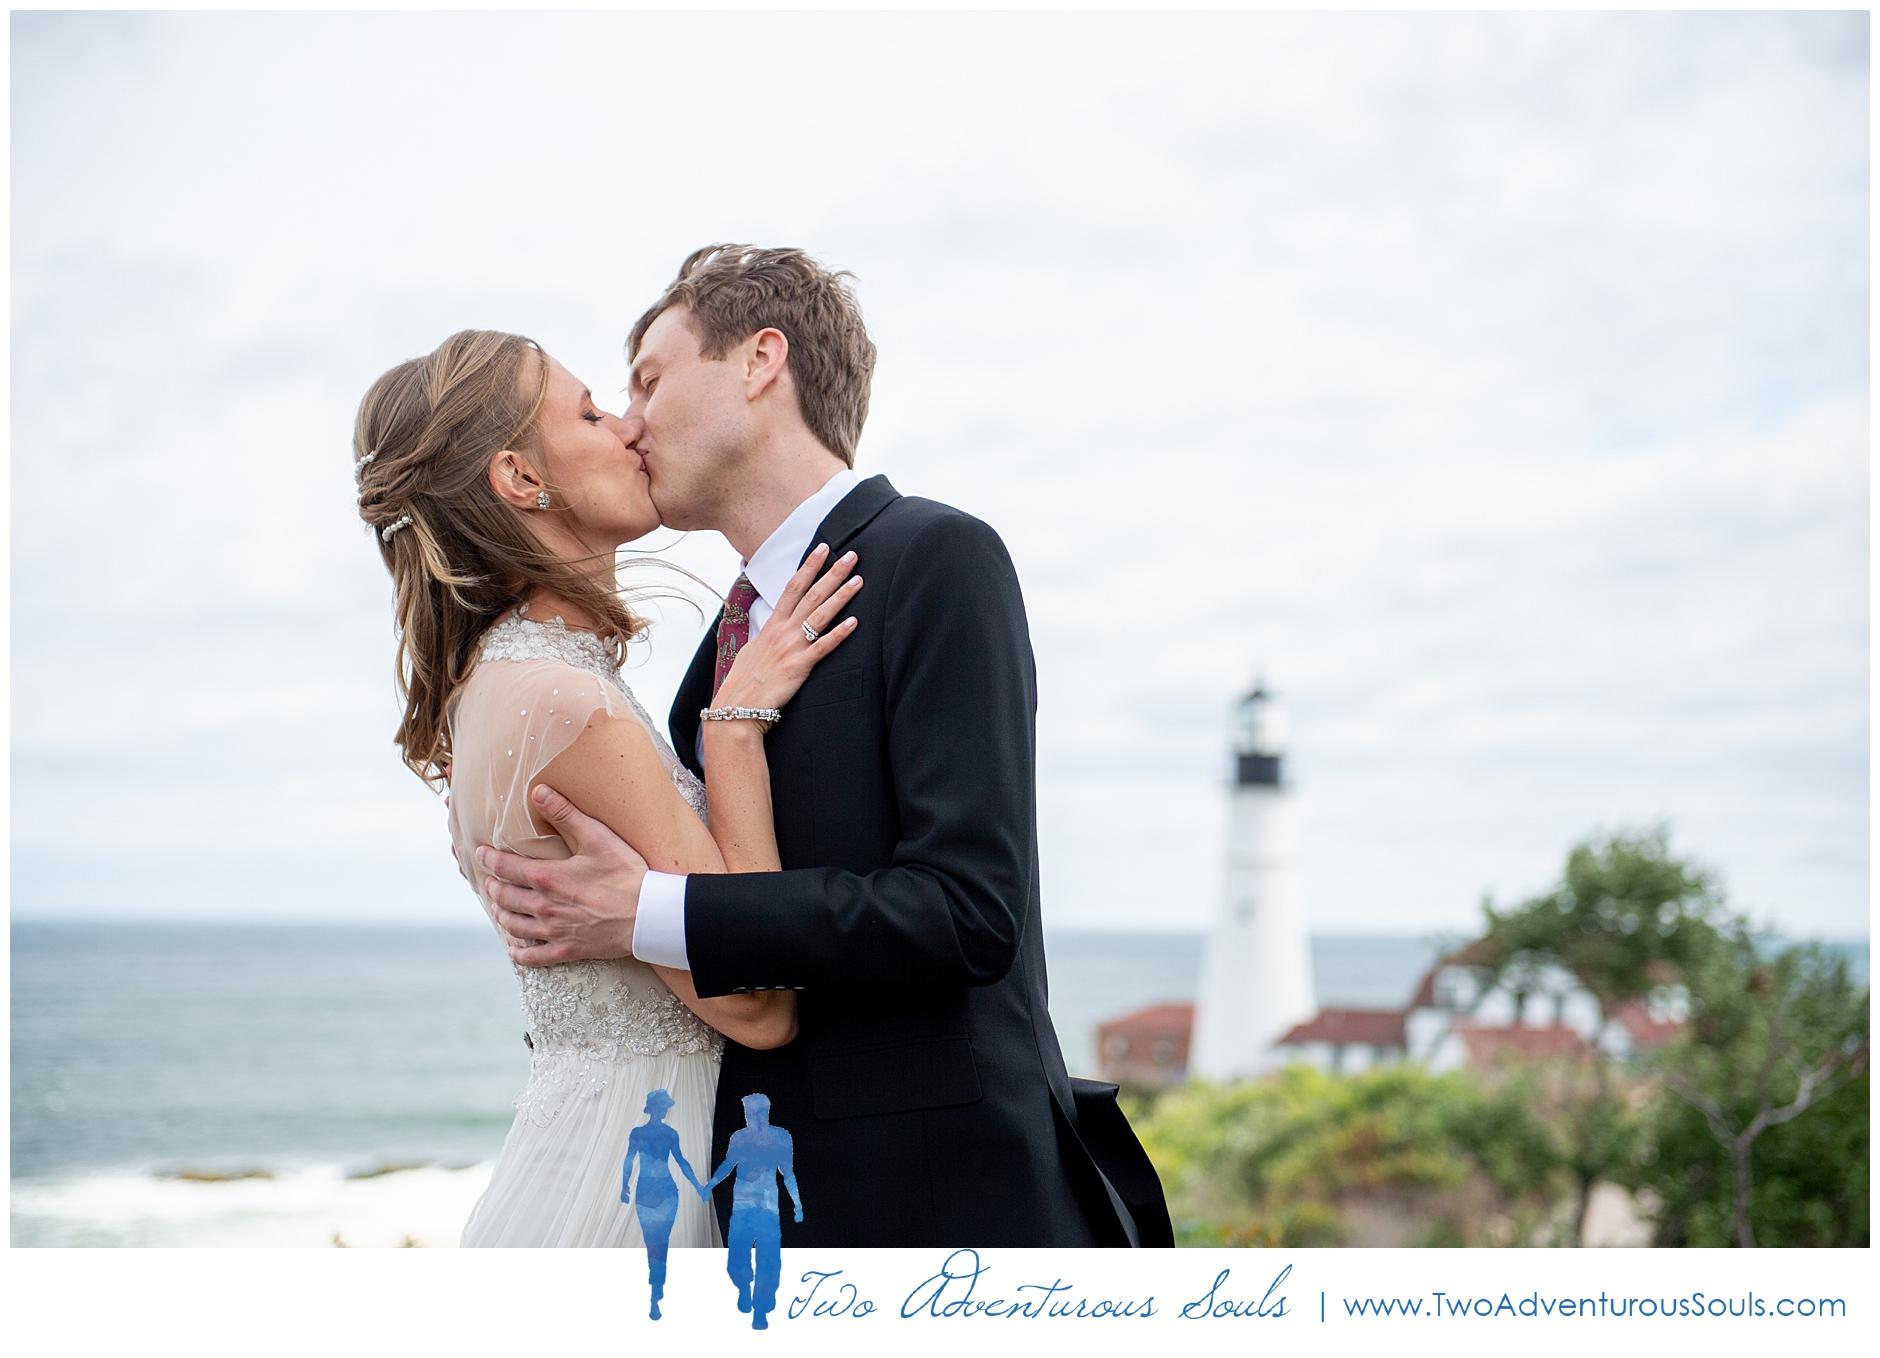 Grace Maine Photographers, Portland Maine Wedding Photographers, Two Adventurous Souls- 090719_0012.jpg